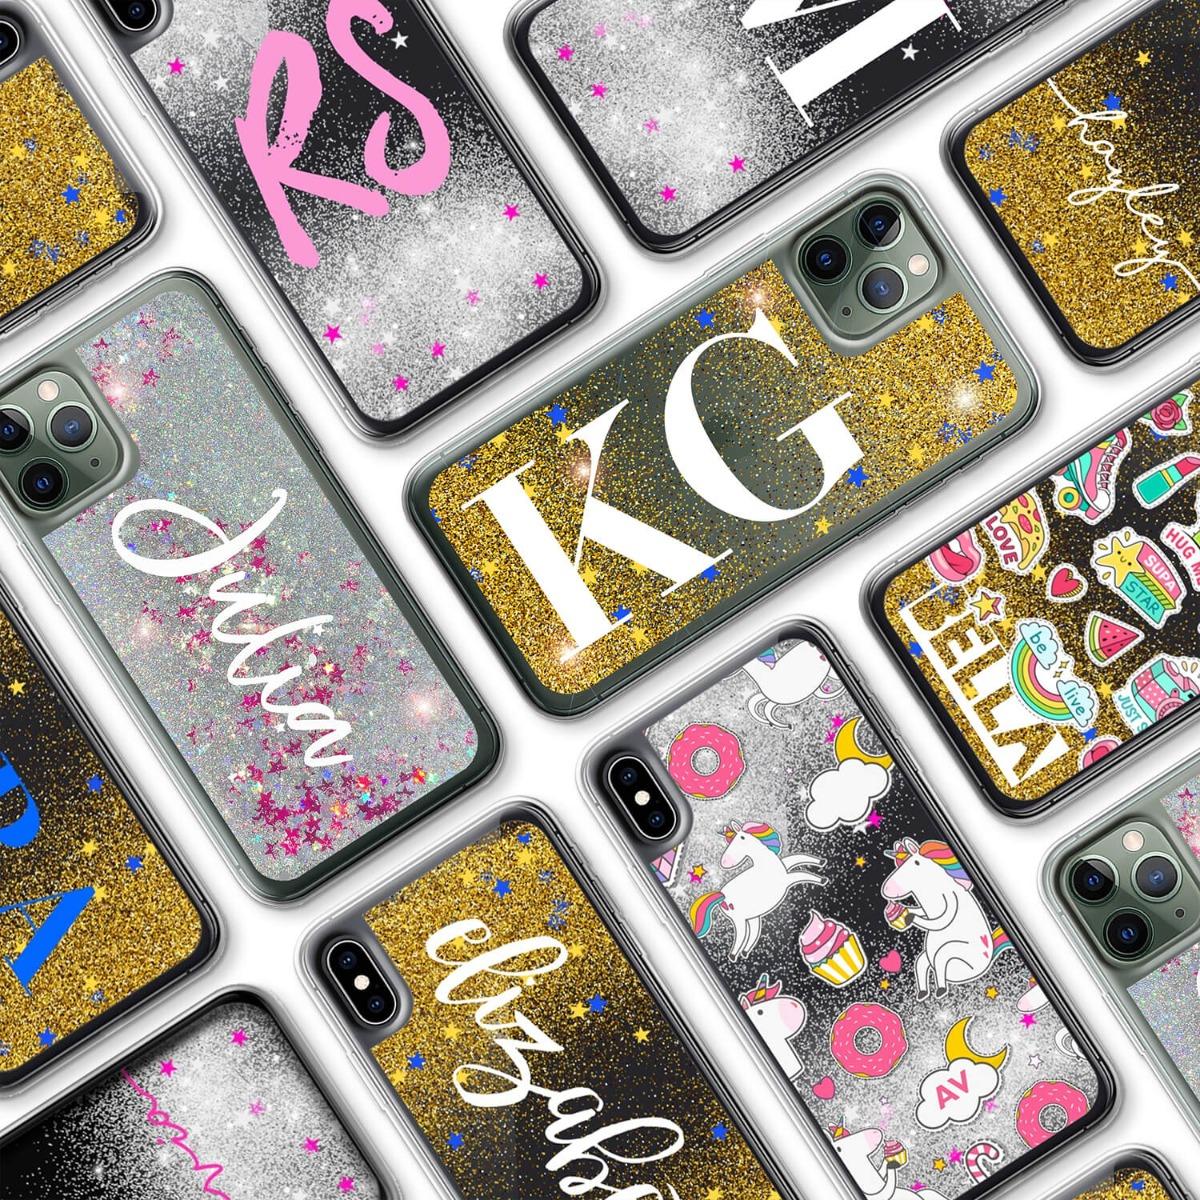 iPhone 11 Pro Max Glitter Case 16127